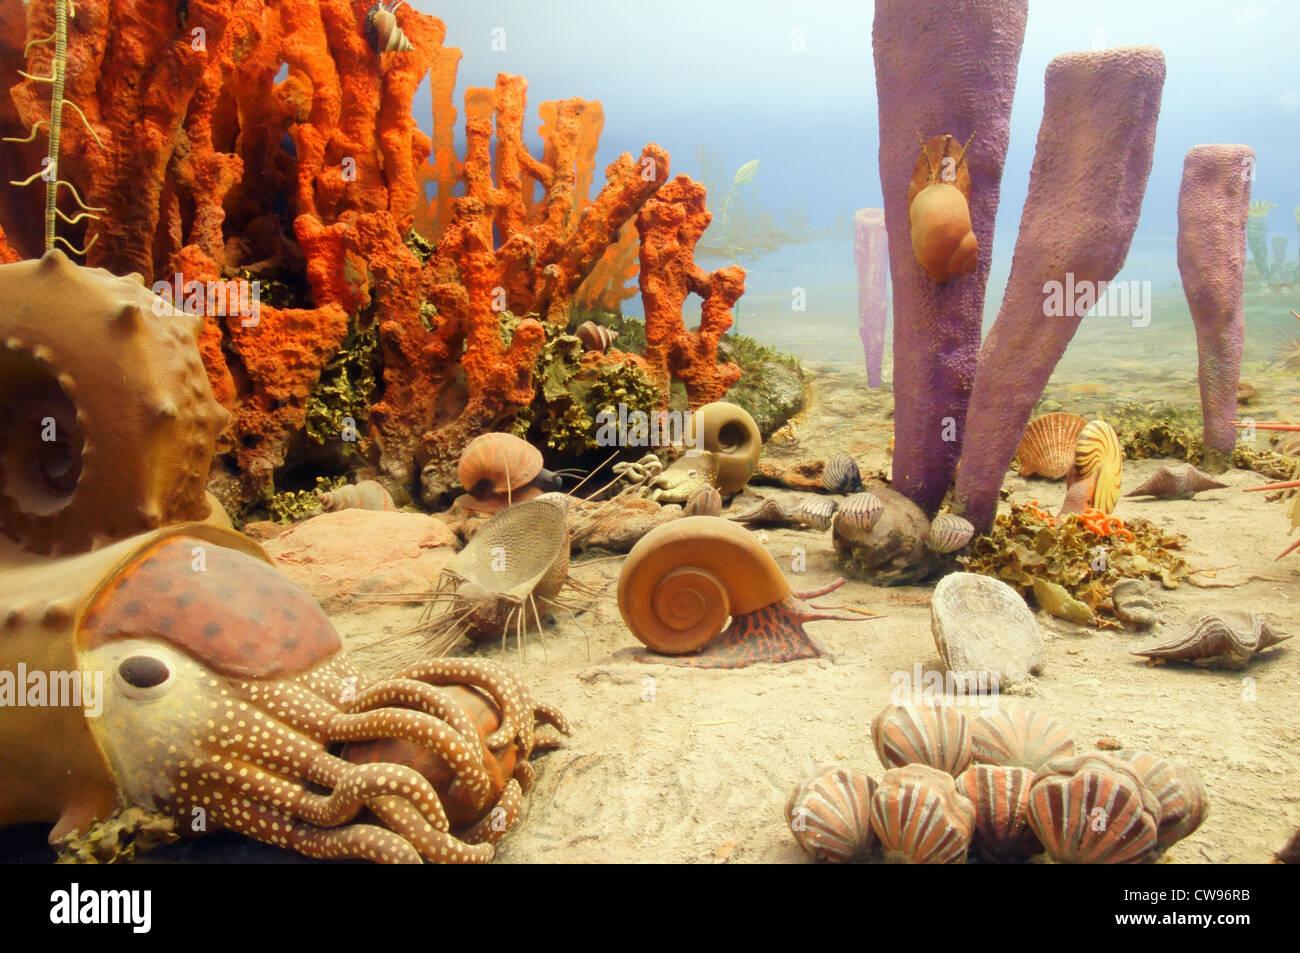 exhibit vegetation wildlife evolution plant plants organisms pennsylvanian period 320 286 million years ago - Stock Image